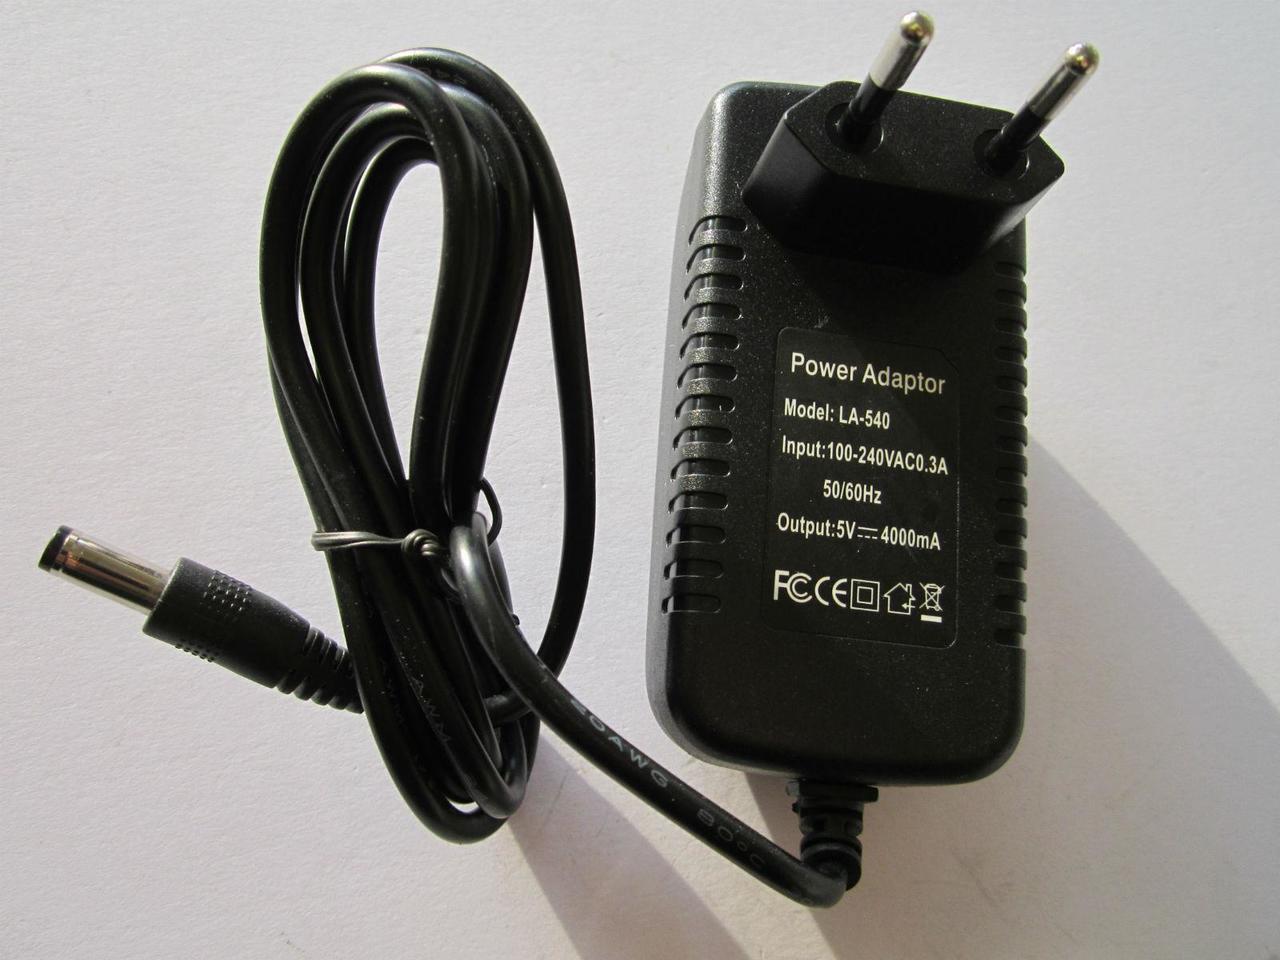 AC supply DC 5V 4A Switching Power Adapter 20W US plug DC 3.5mm x 1.35mm 4000mA